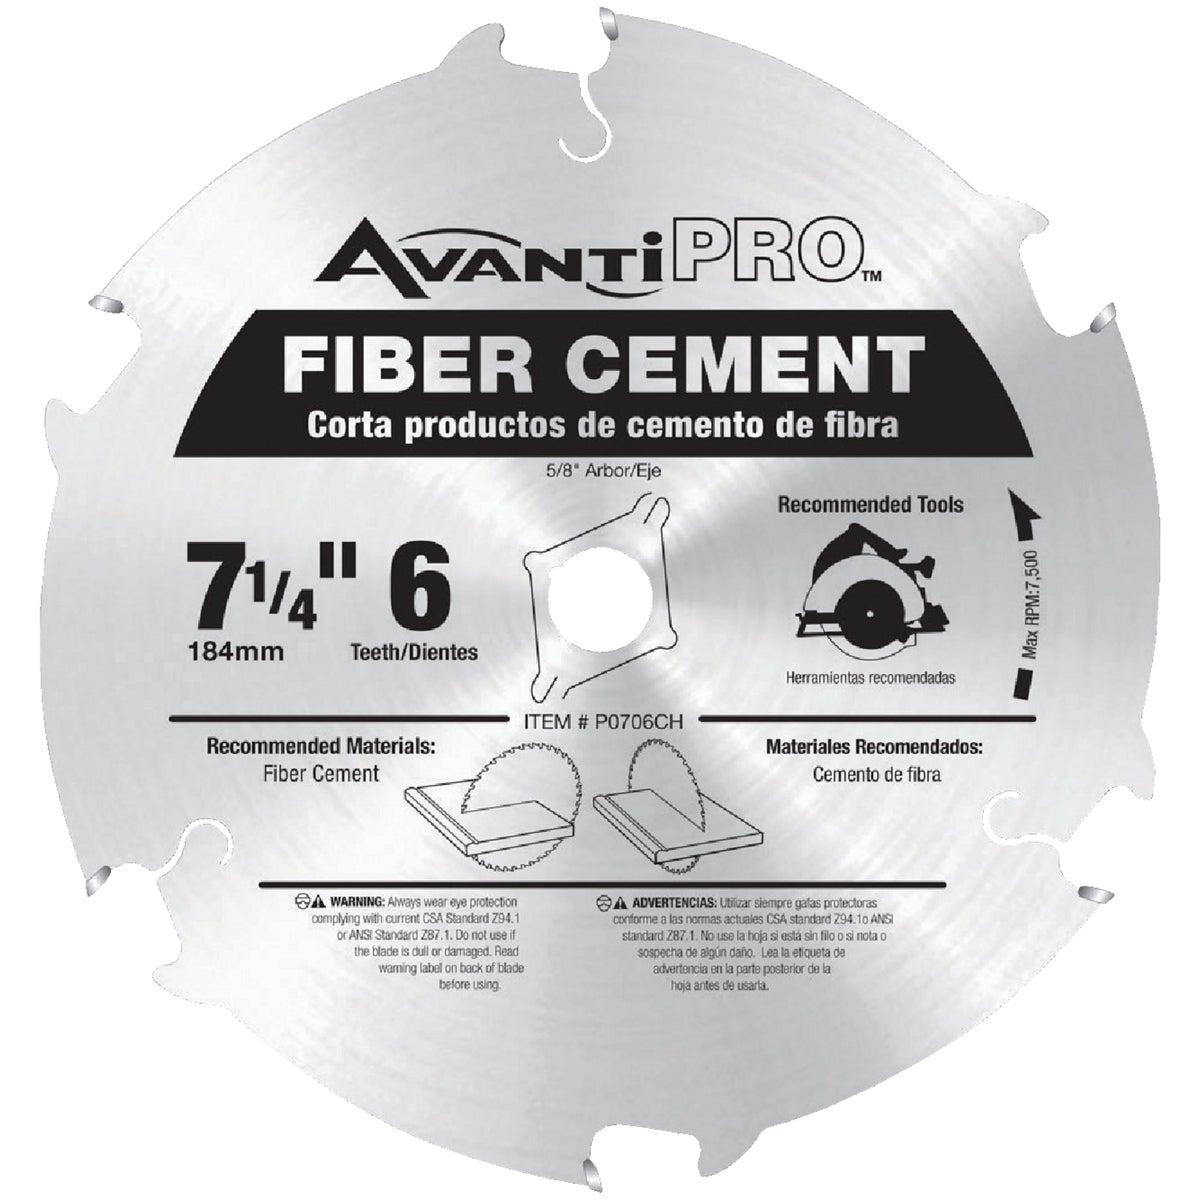 Avanti Pro 7-1/4 In. 6-Tooth Fiber Cement Circular Saw Blade